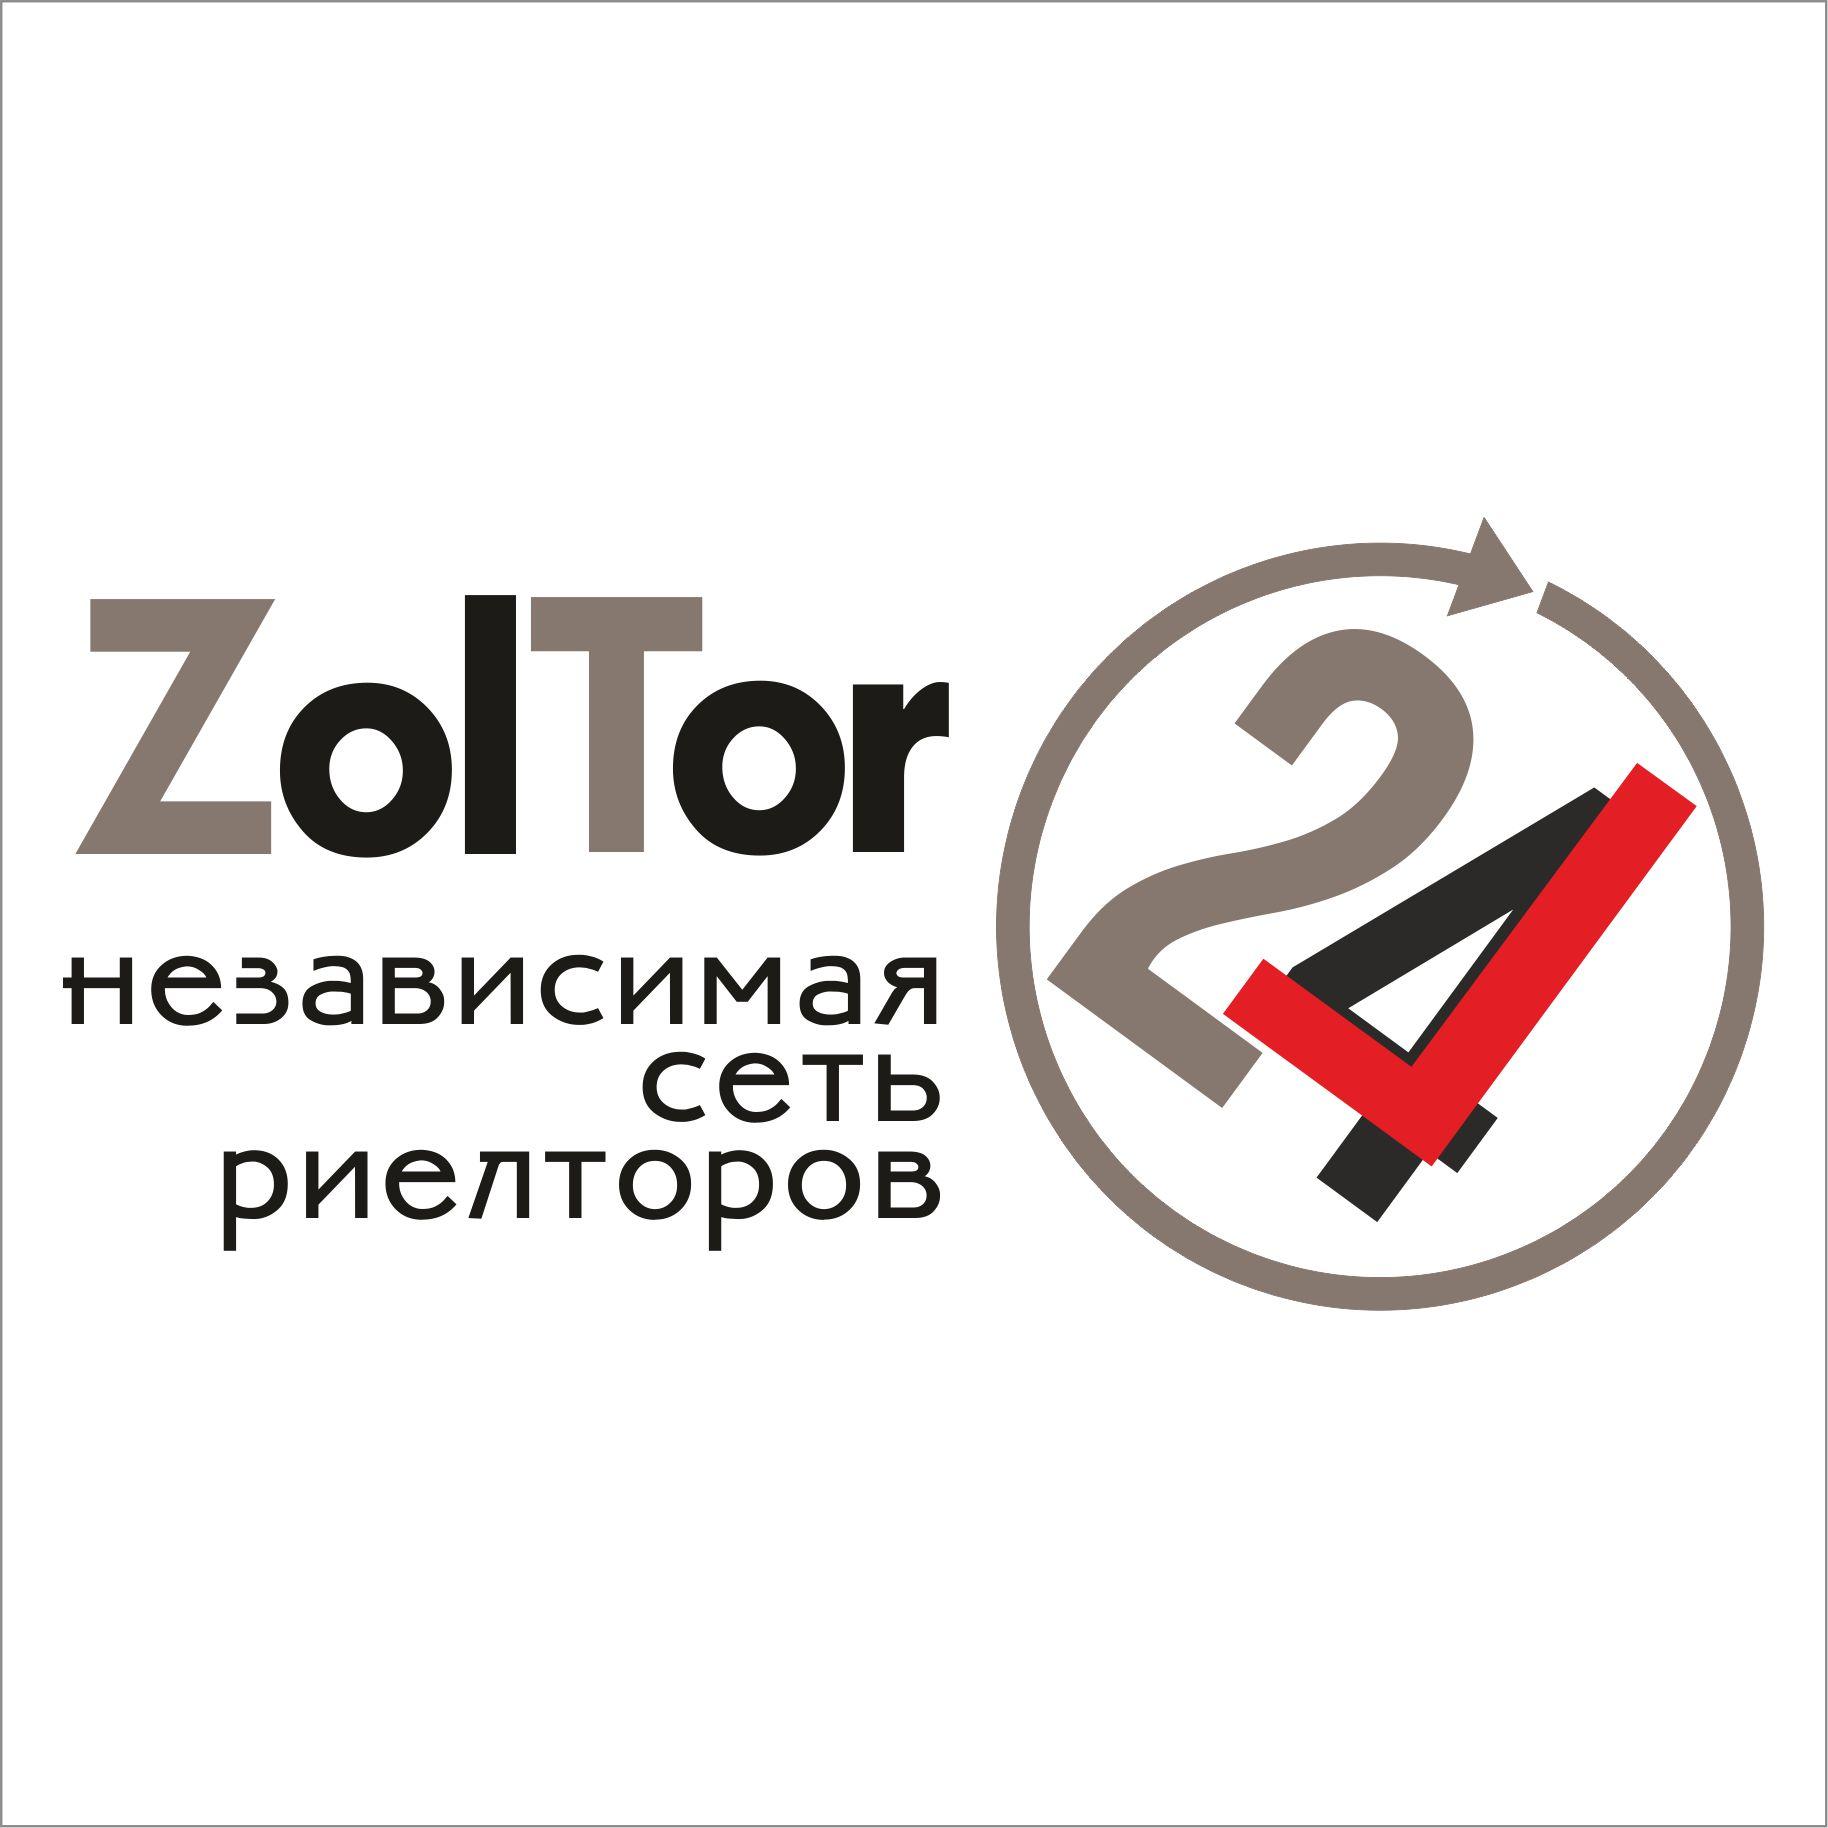 Логотип и фирменный стиль ZolTor24 фото f_5145c8a47033ad18.jpg